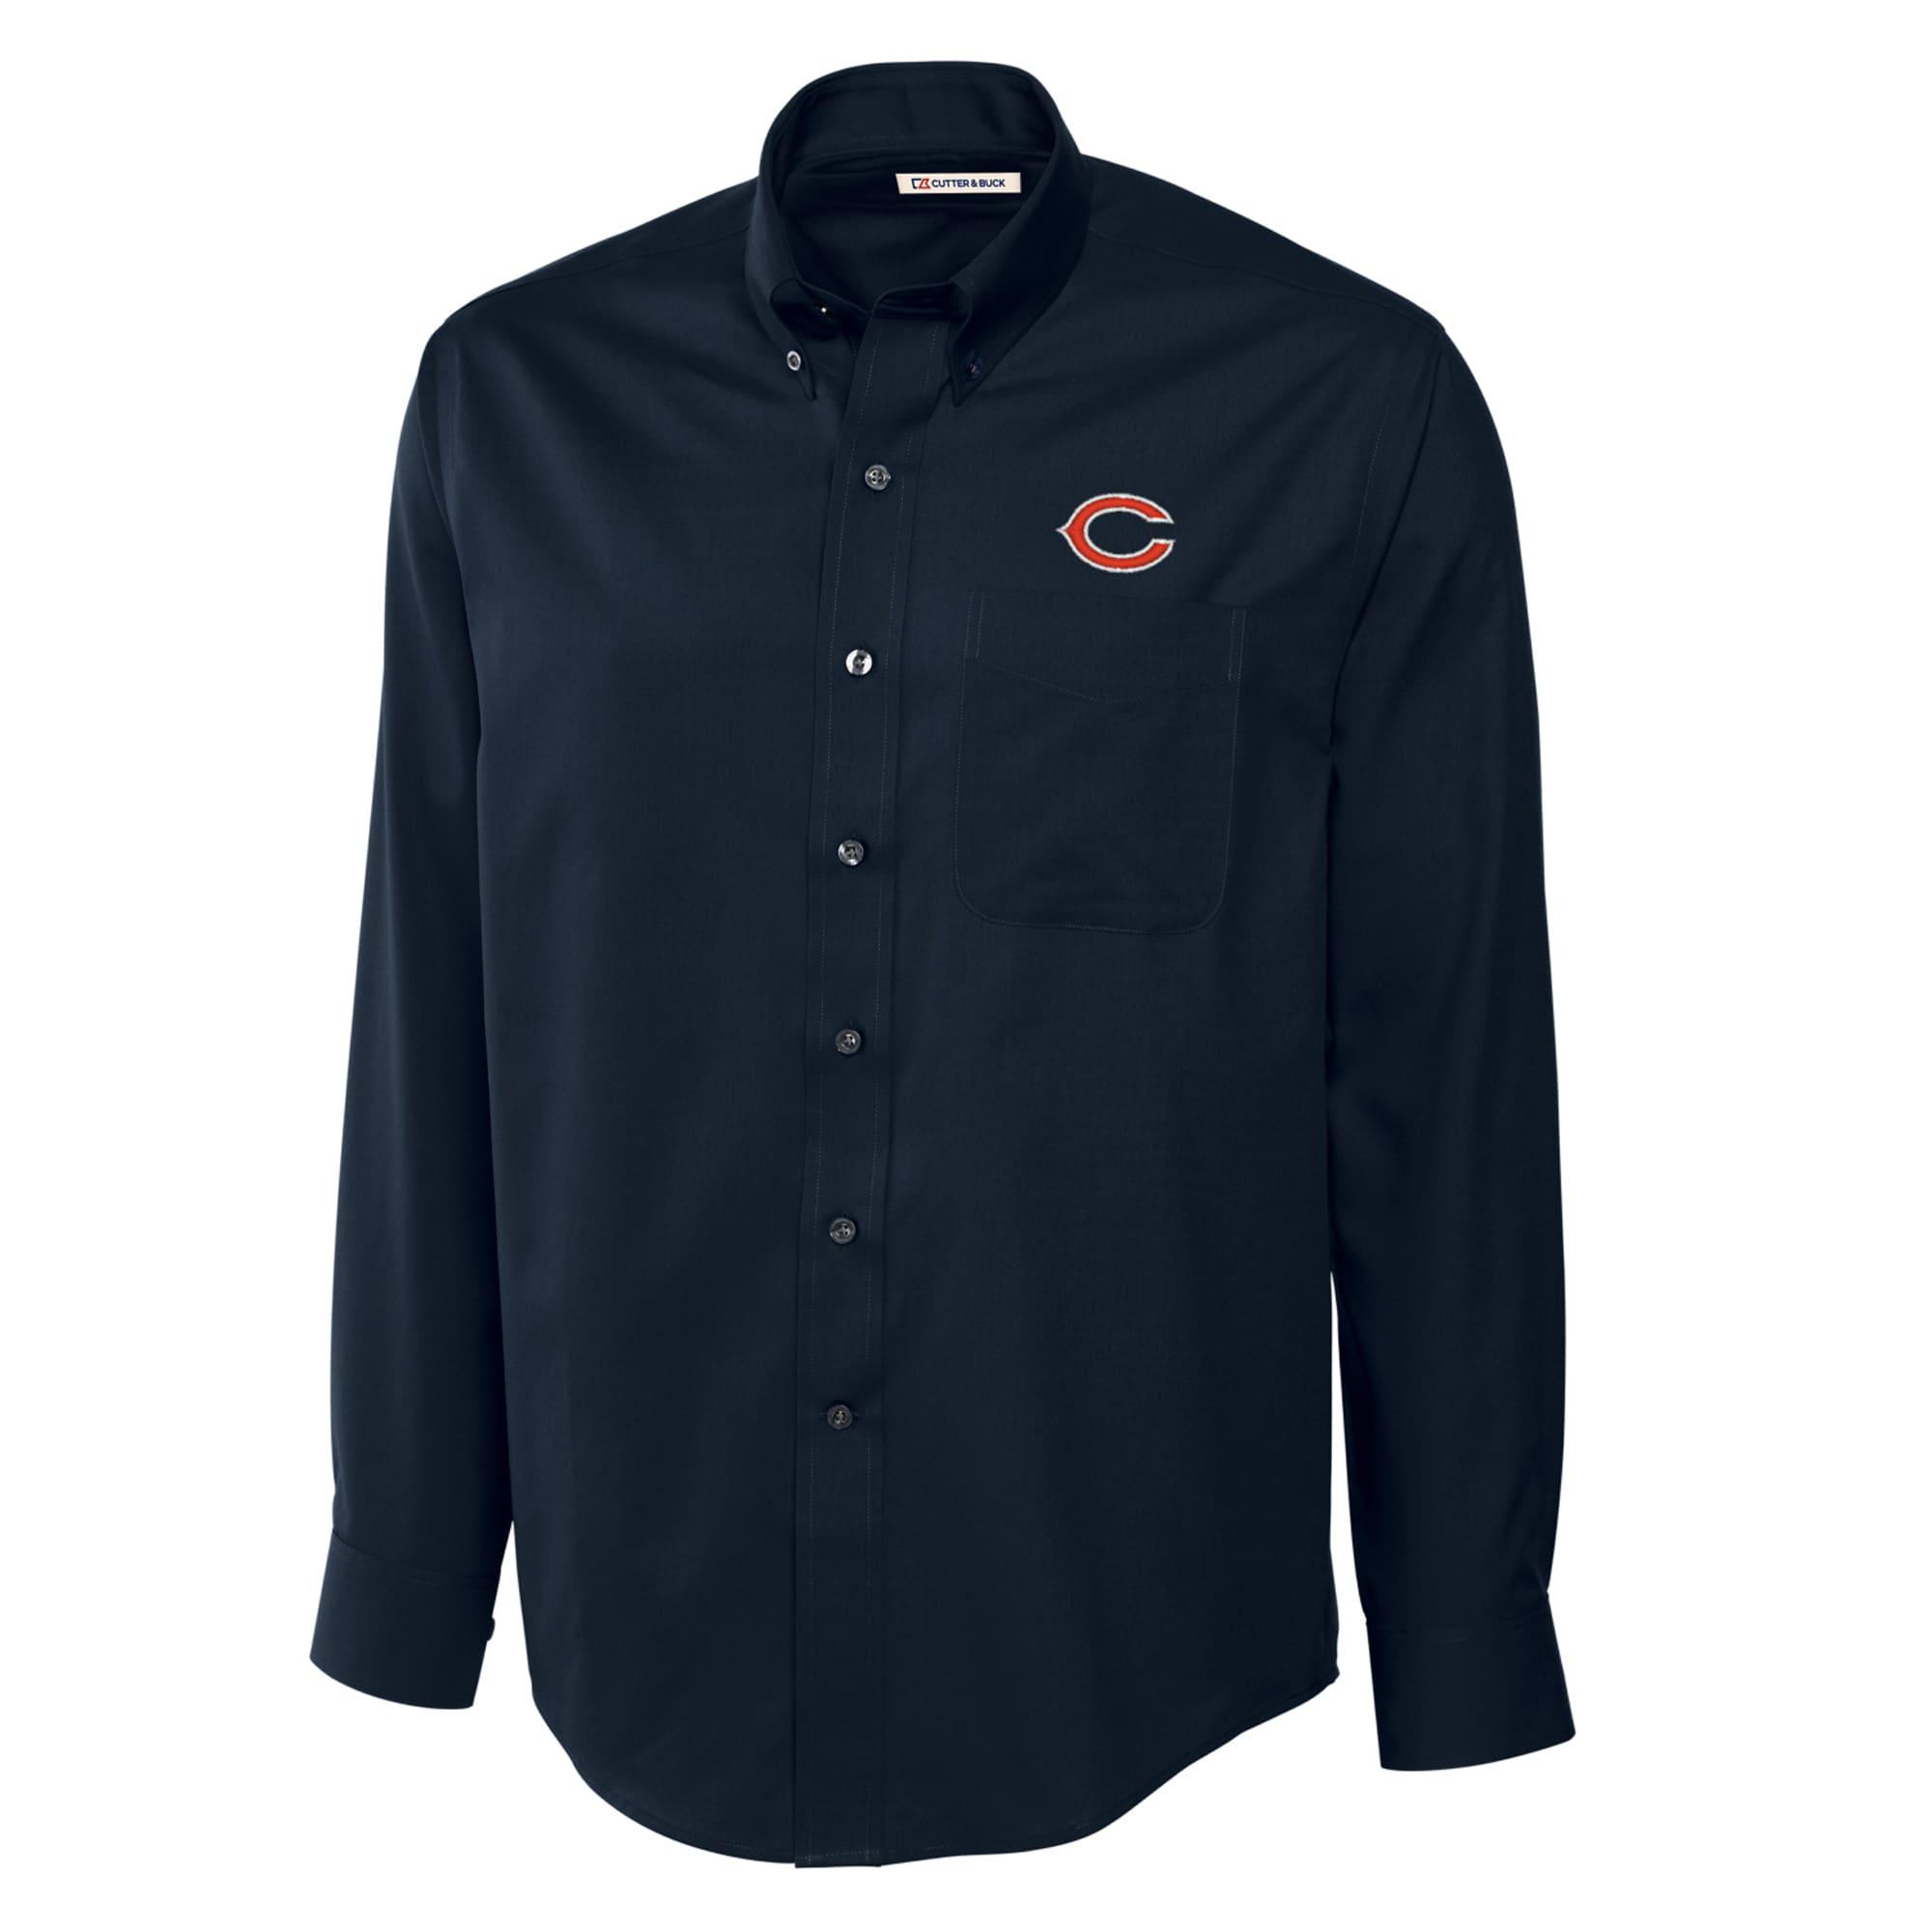 Chicago Bears Cutter & Buck Big & Tall Epic Easy Care Woven Long Sleeve Shirt - Navy